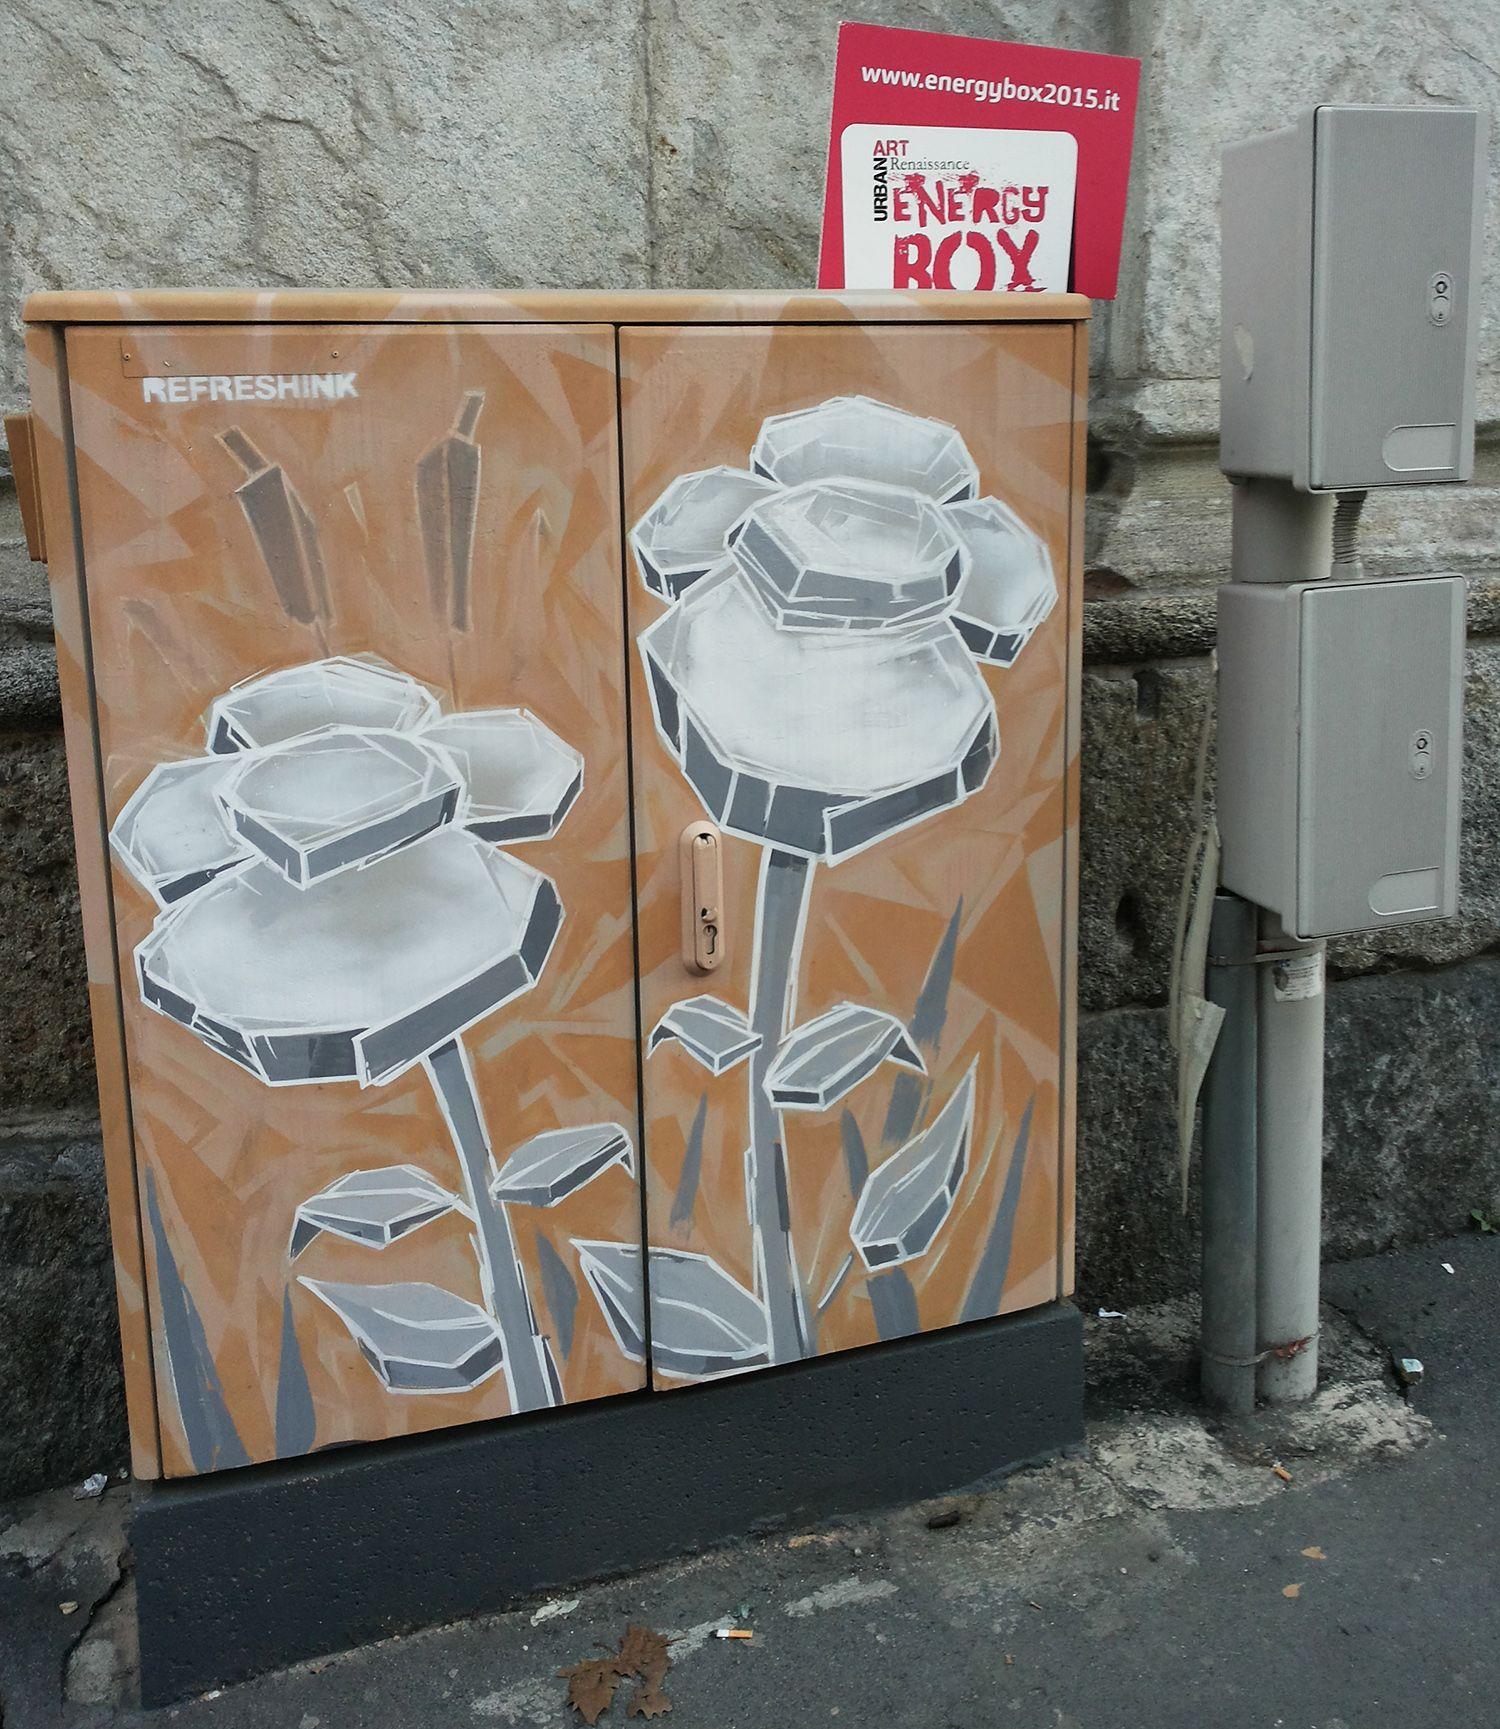 #energybox2015 presso San Maurizio al Monastero Maggiore, corso Magenta by Refreshink #Urbanartrenaissance #StreetArt #SprayPaint #Graffiti